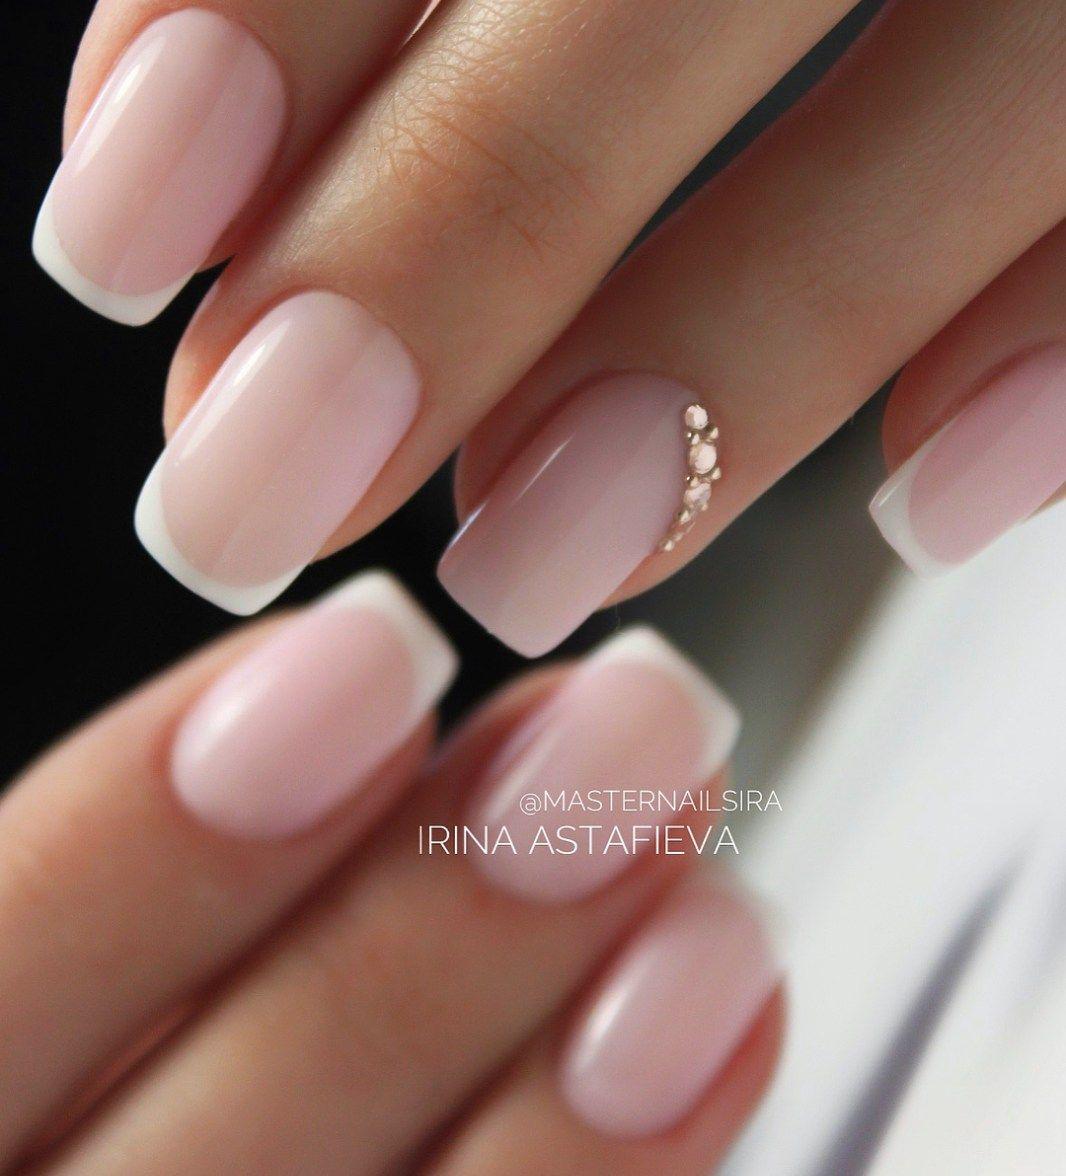 17 Gorgeous Nail Art Design Ideas To Inspire Nailart Nailideas Nails Gelove Nehty Design Nehtu Nehet